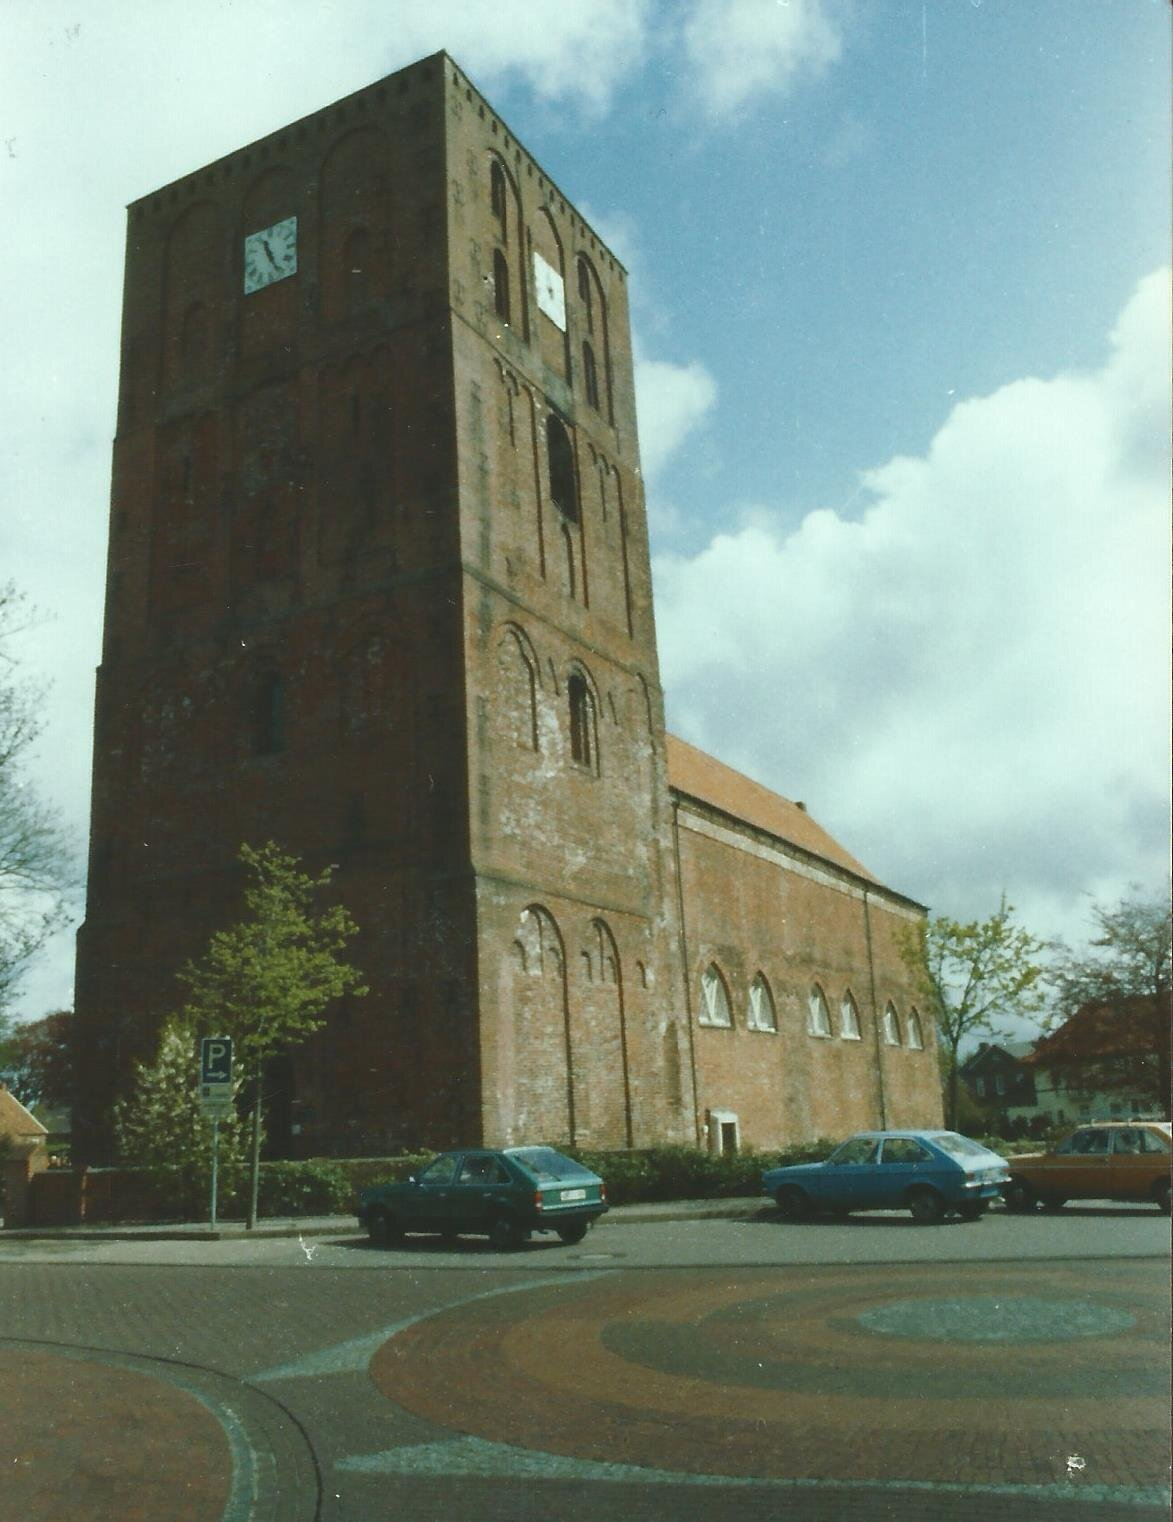 Marienhafe Kirchturm